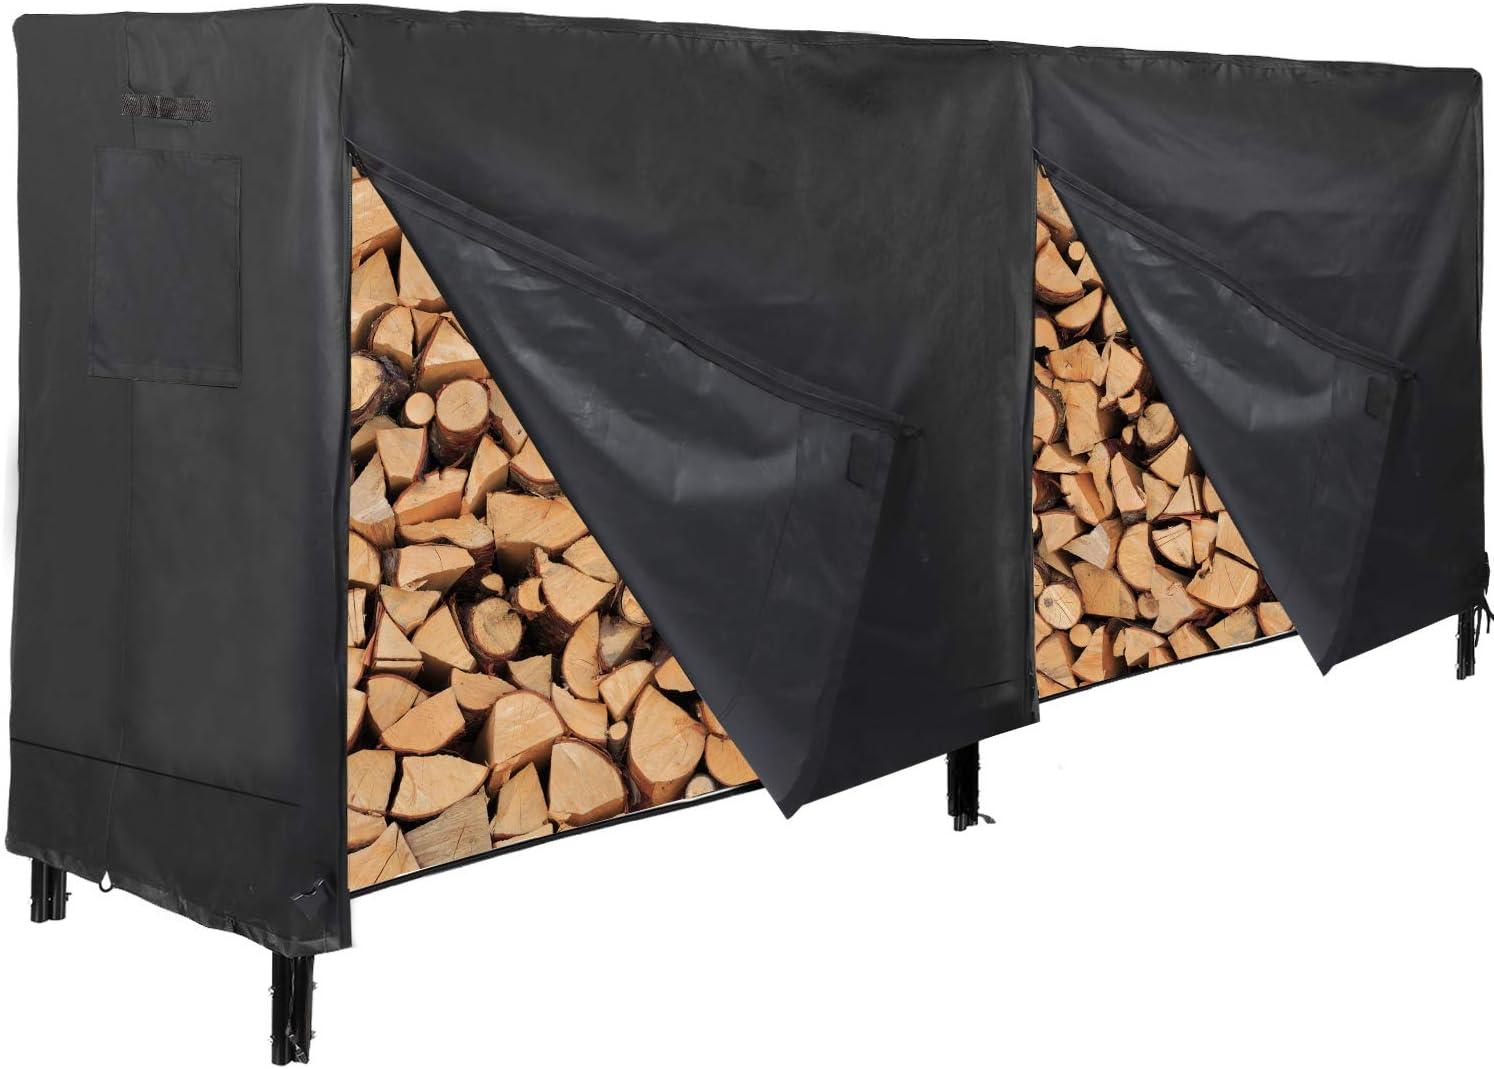 CAMPMOON 8FT Firewood Rack Covers Oxfor Max 43% OFF Overseas parallel import regular item 600D Durable Waterproof